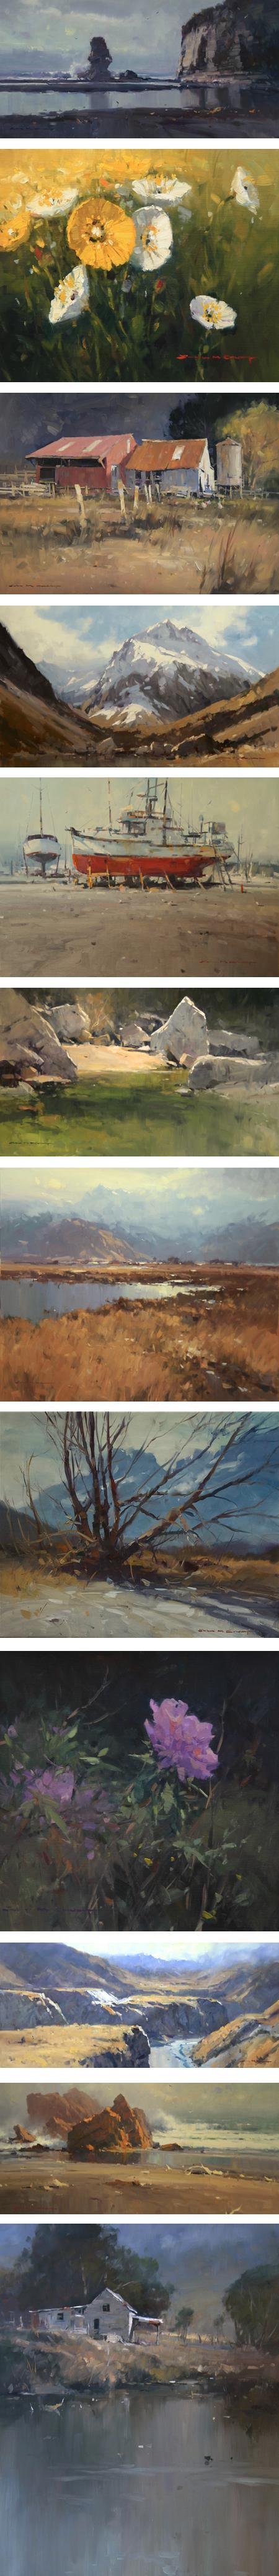 John Crump, New Zealand landscape painter